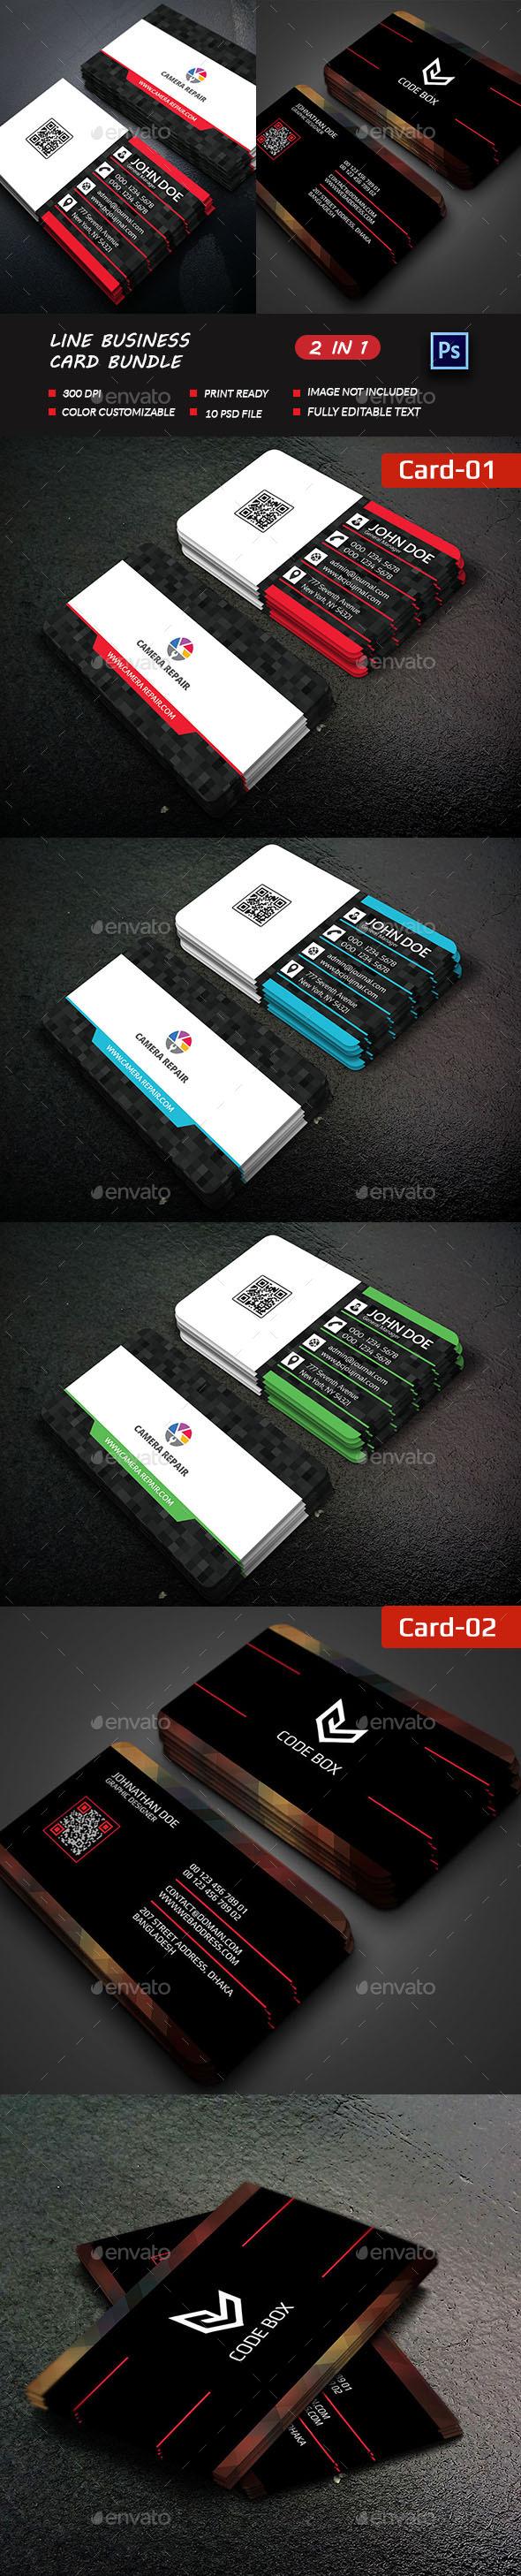 Line Business Card Bundle - Business Cards Print Templates